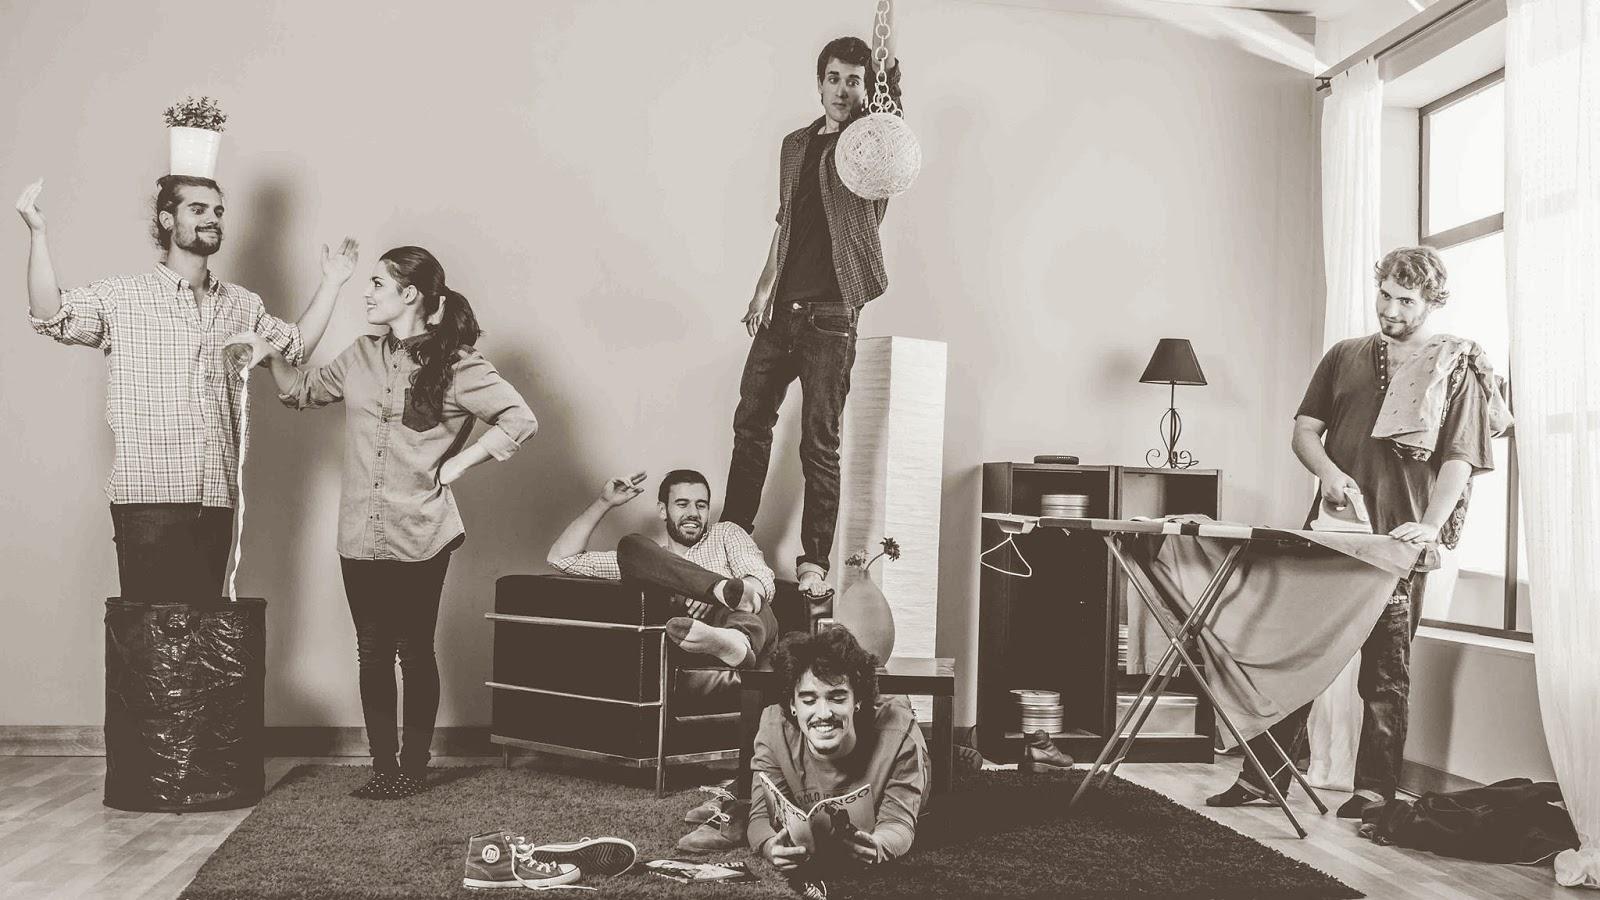 Hynkel grupo de música